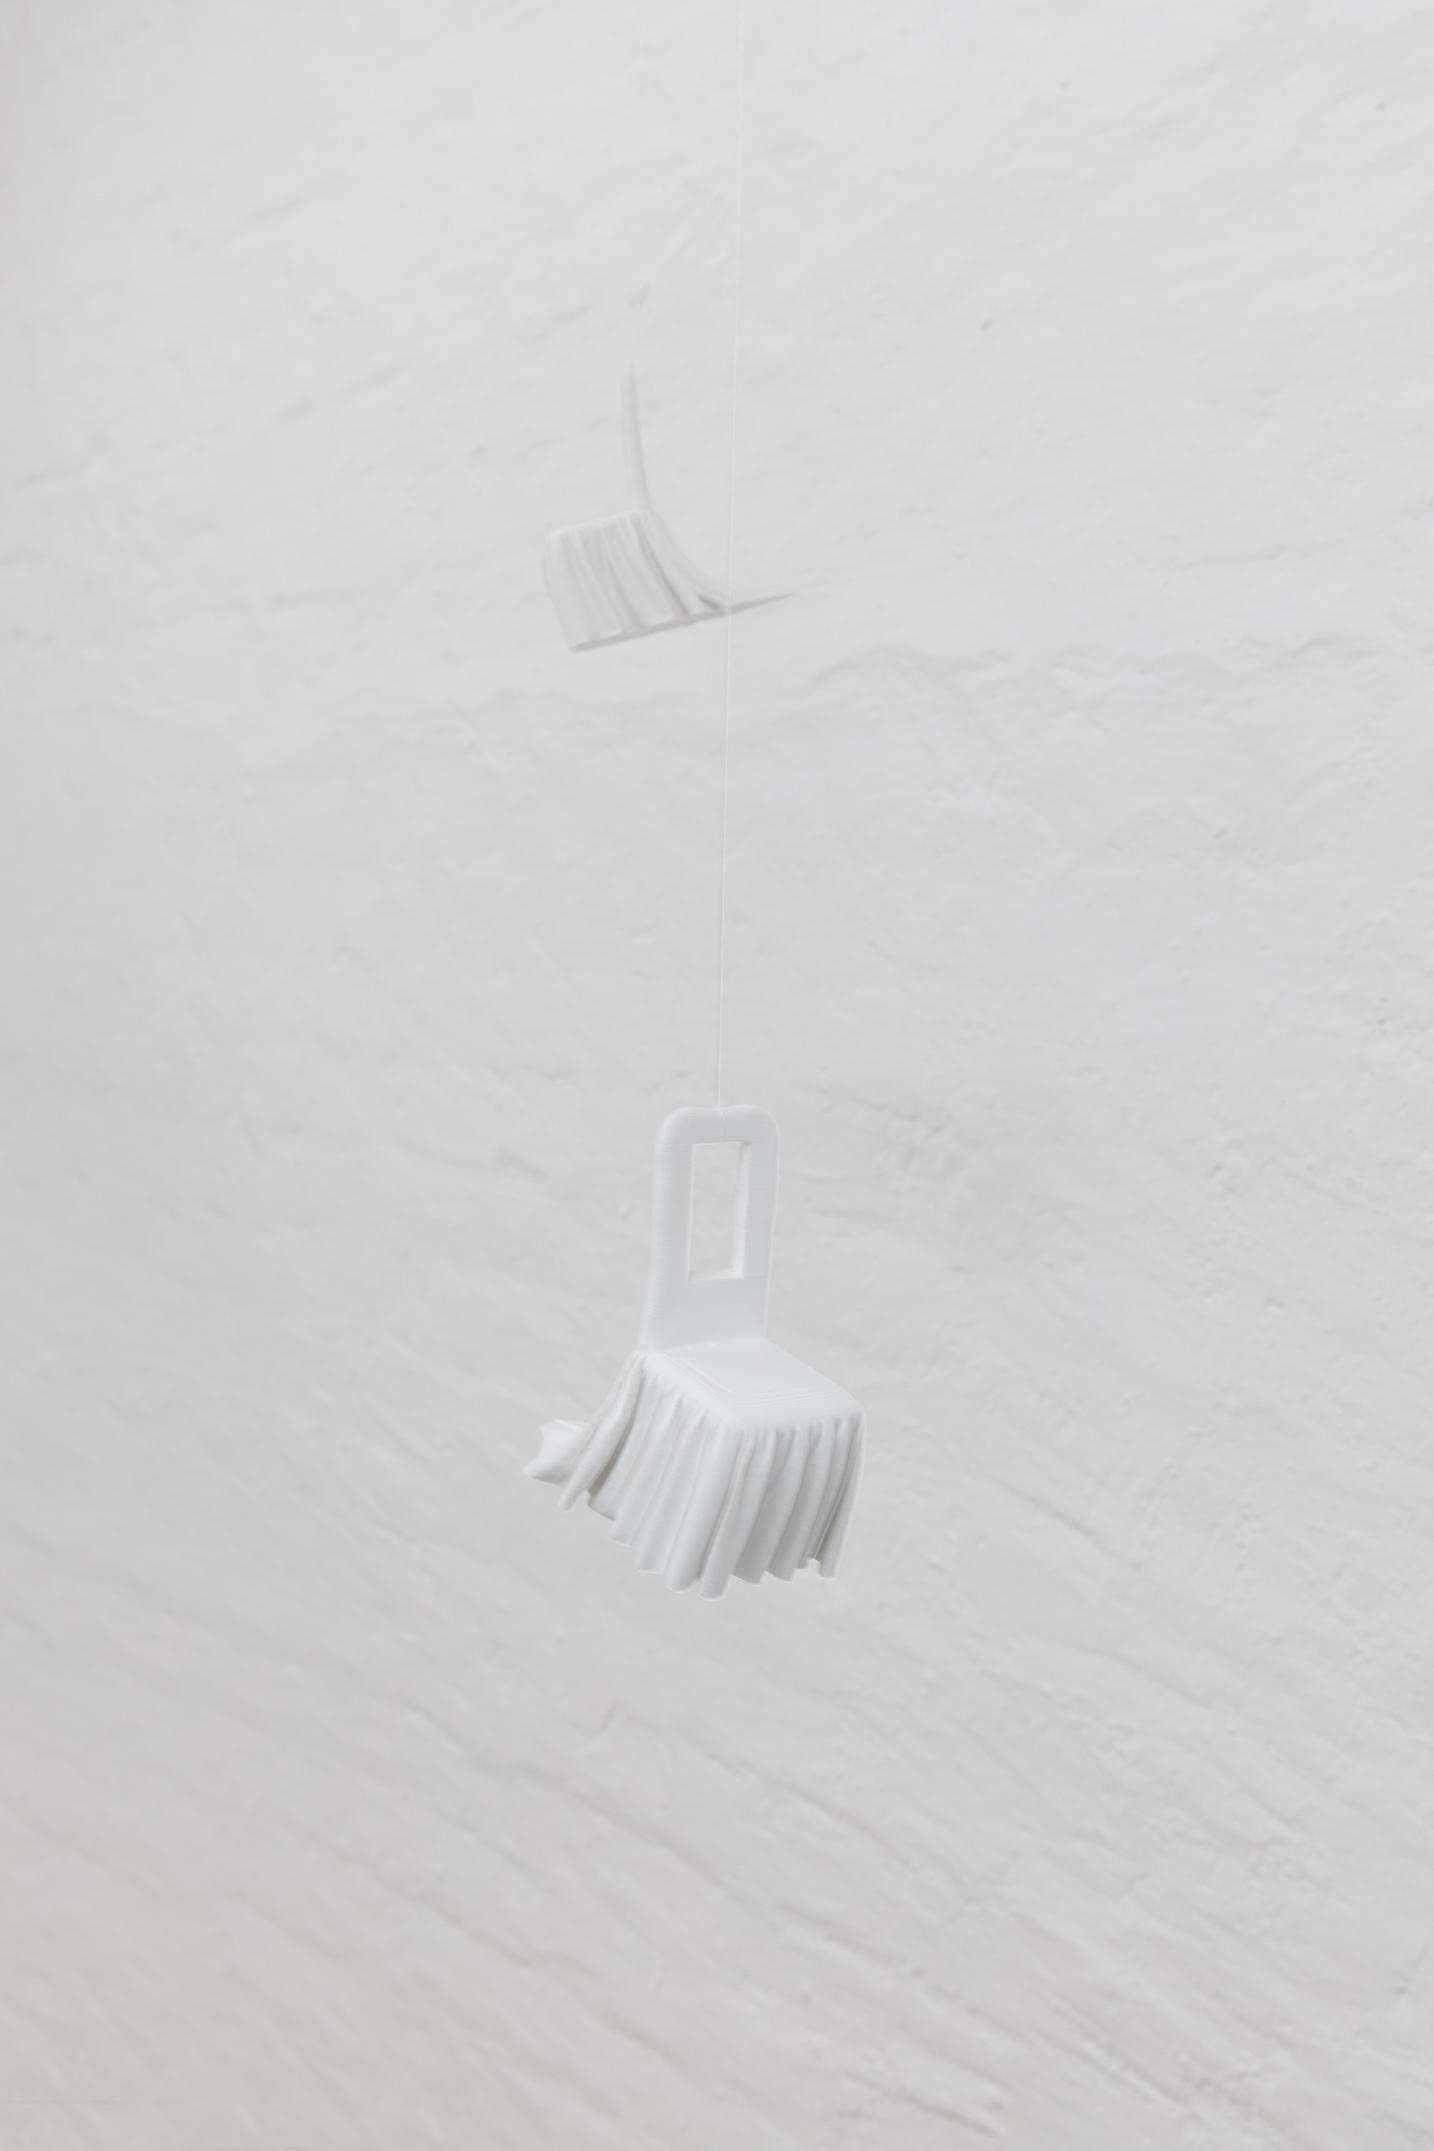 Lap-See Lam, Phantom Banquet Chair, 2019, Polylactide